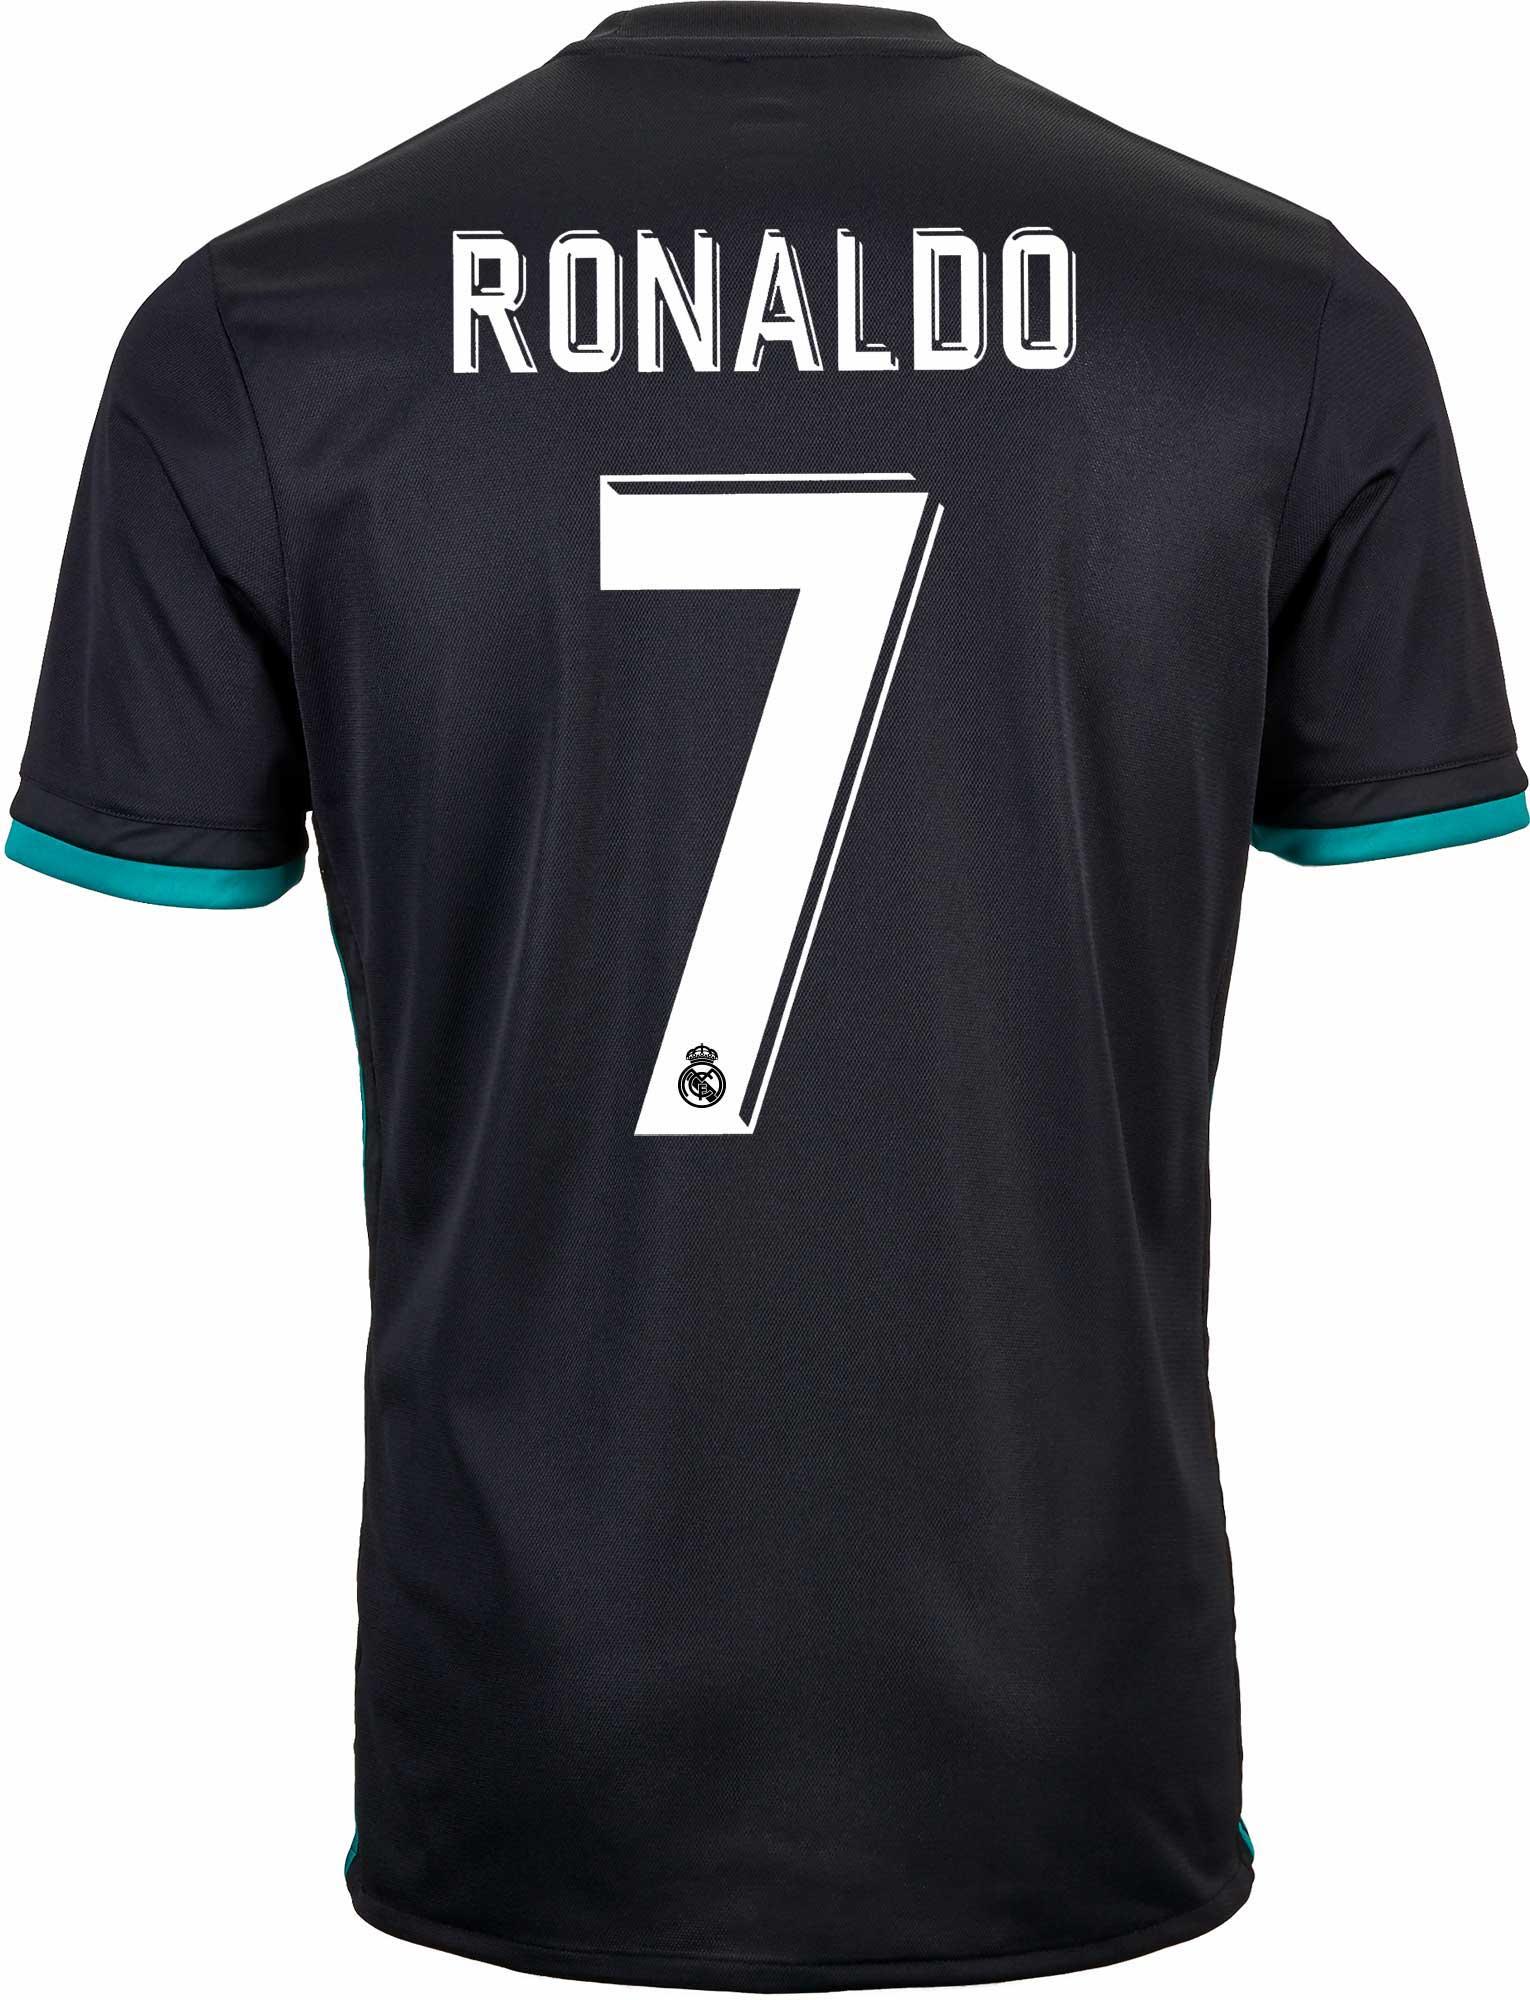 new styles 93888 a0307 2017/18 adidas Kids Cristiano Ronaldo Real Madrid Away ...